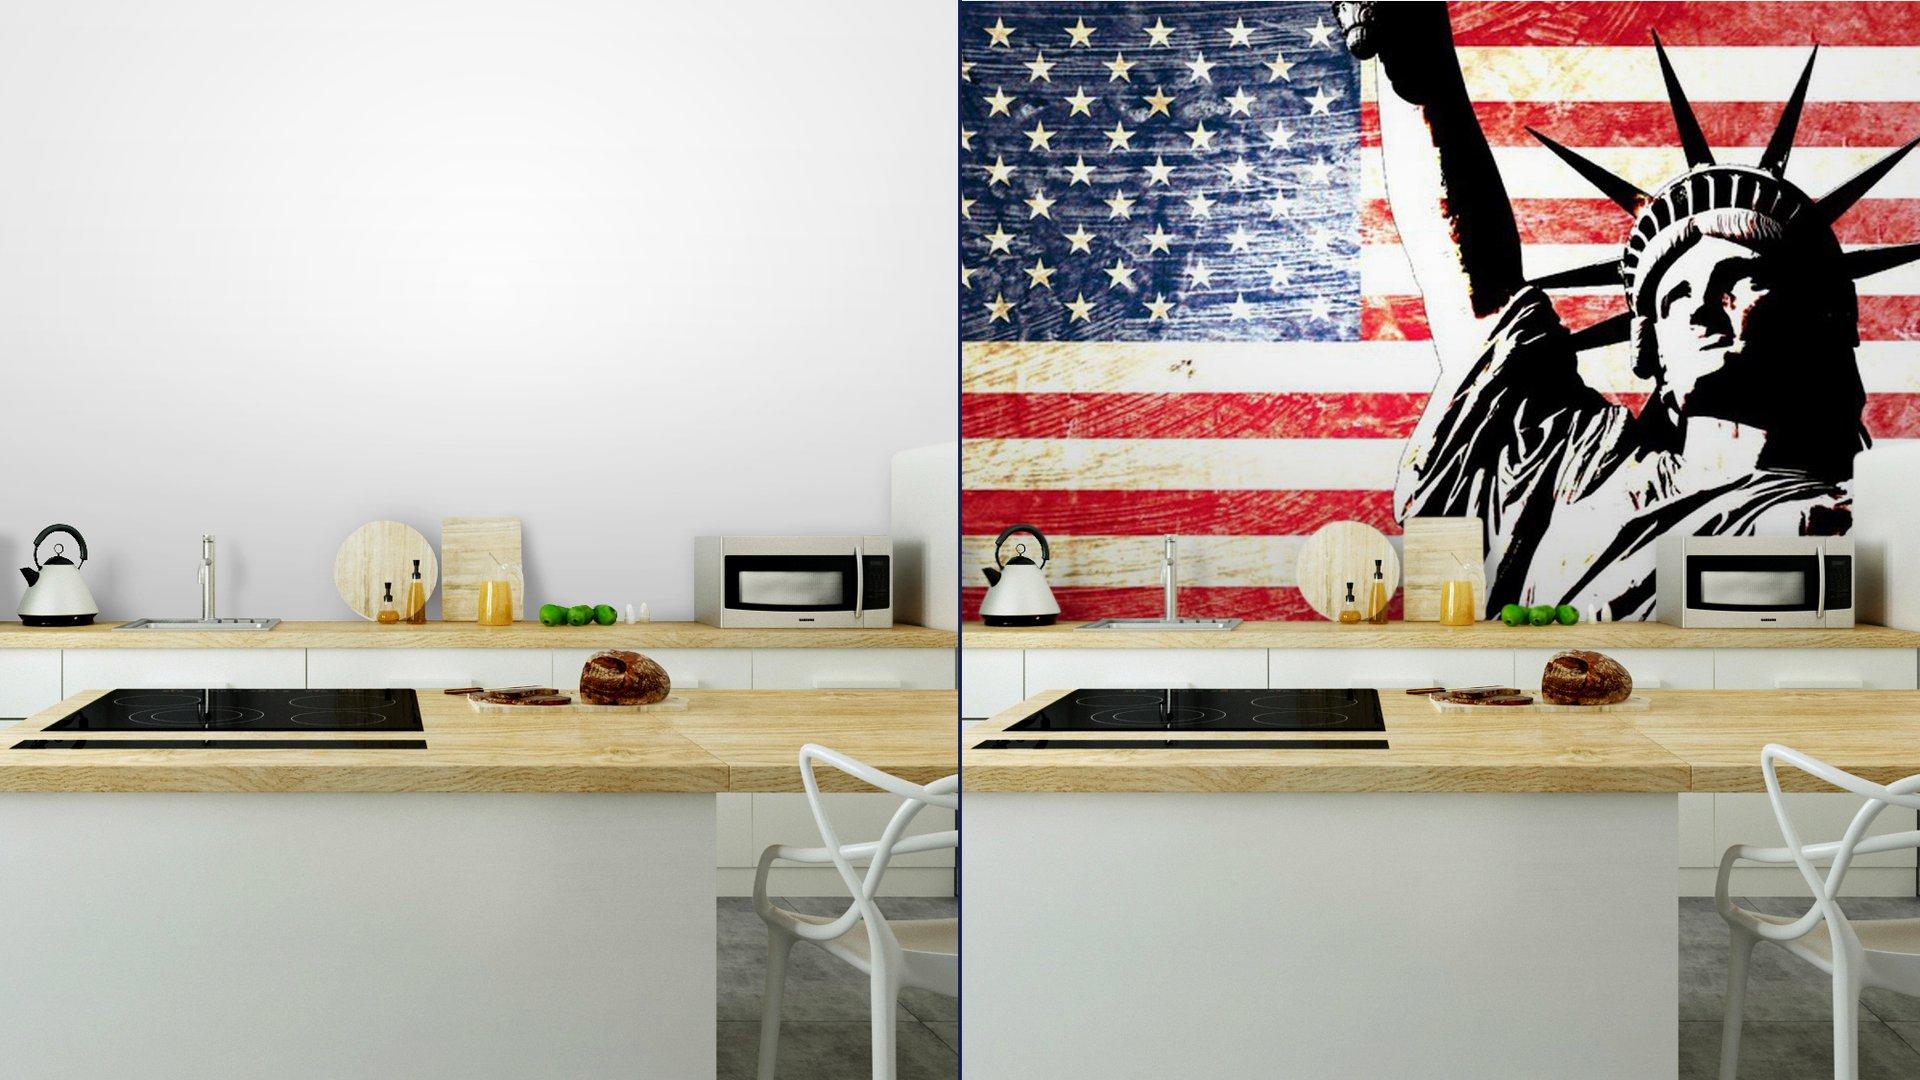 drapeau usa statue de la libert vinyl wall mural pixers we live to change. Black Bedroom Furniture Sets. Home Design Ideas